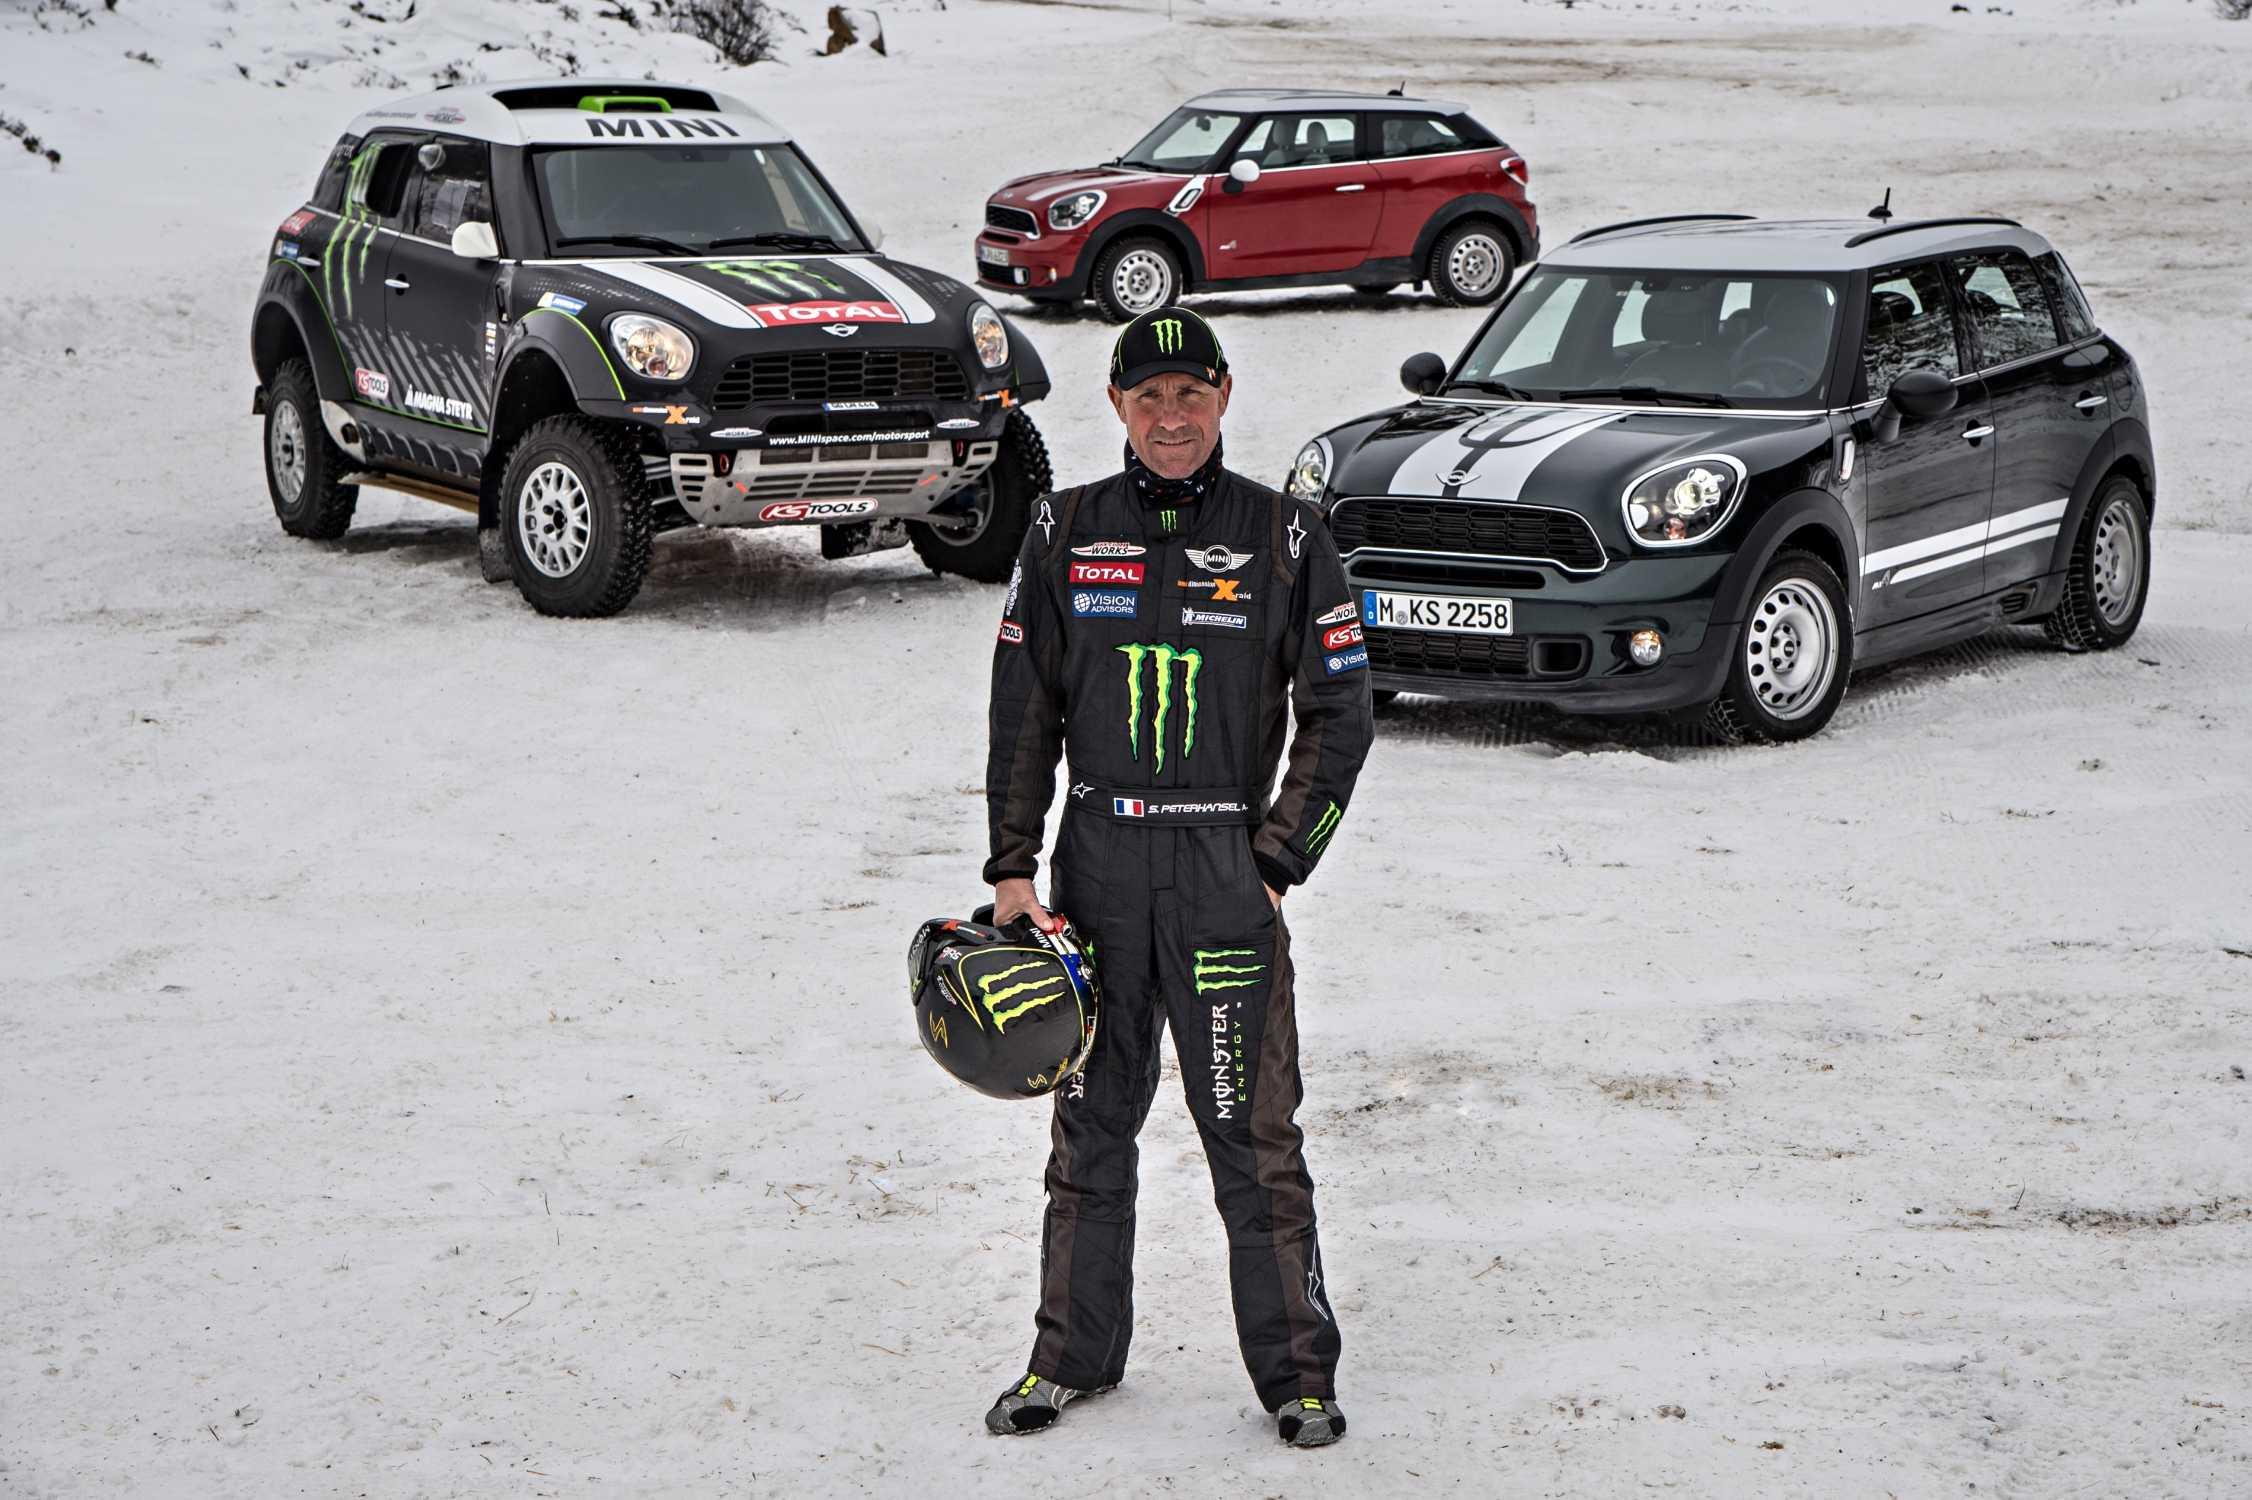 Final Rehearsal In The Snow Dakar Rally Drivers Test The Mini All4